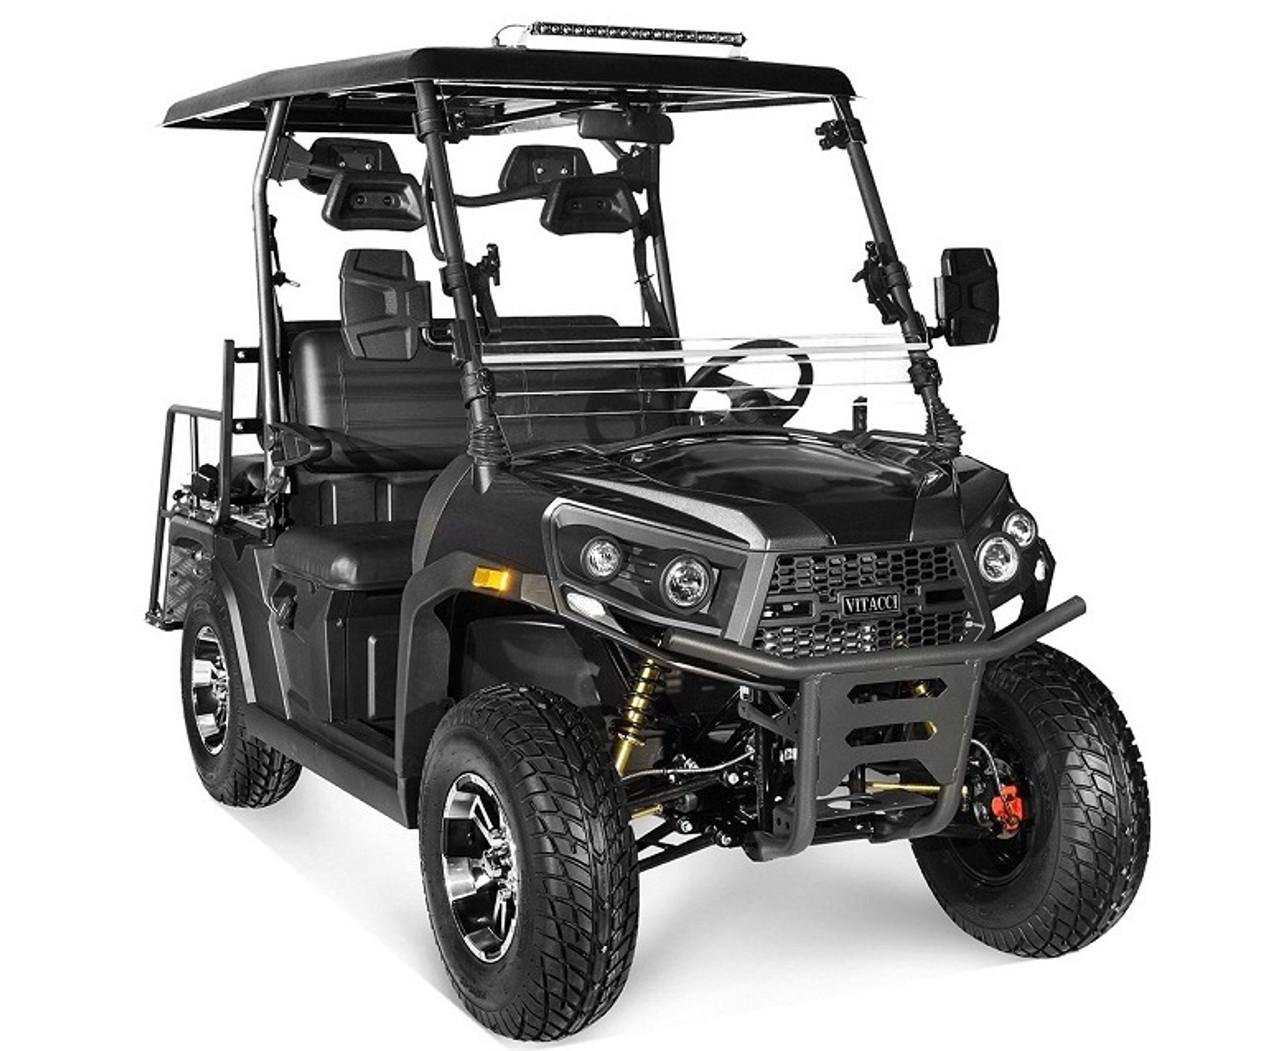 Black - Vitacci Rover-200 EFI 169cc (Golf Cart) UTV, 4-stroke, Single-cylinder, Oil-cooled - Fully Assembled and Tested